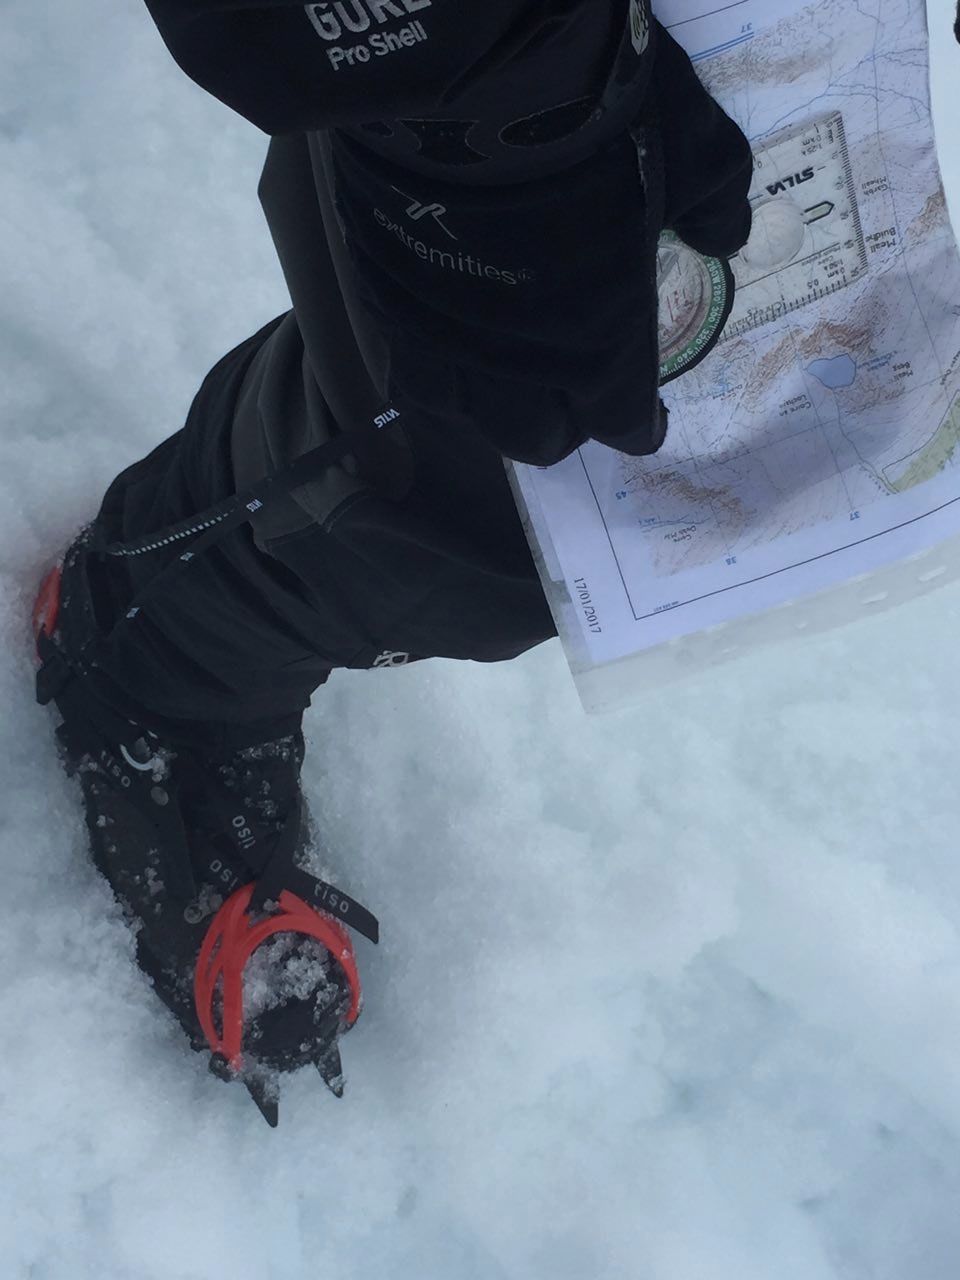 Tricky navigation between Beinn a'Chreachain and Beinn Achaladair in snow & fog